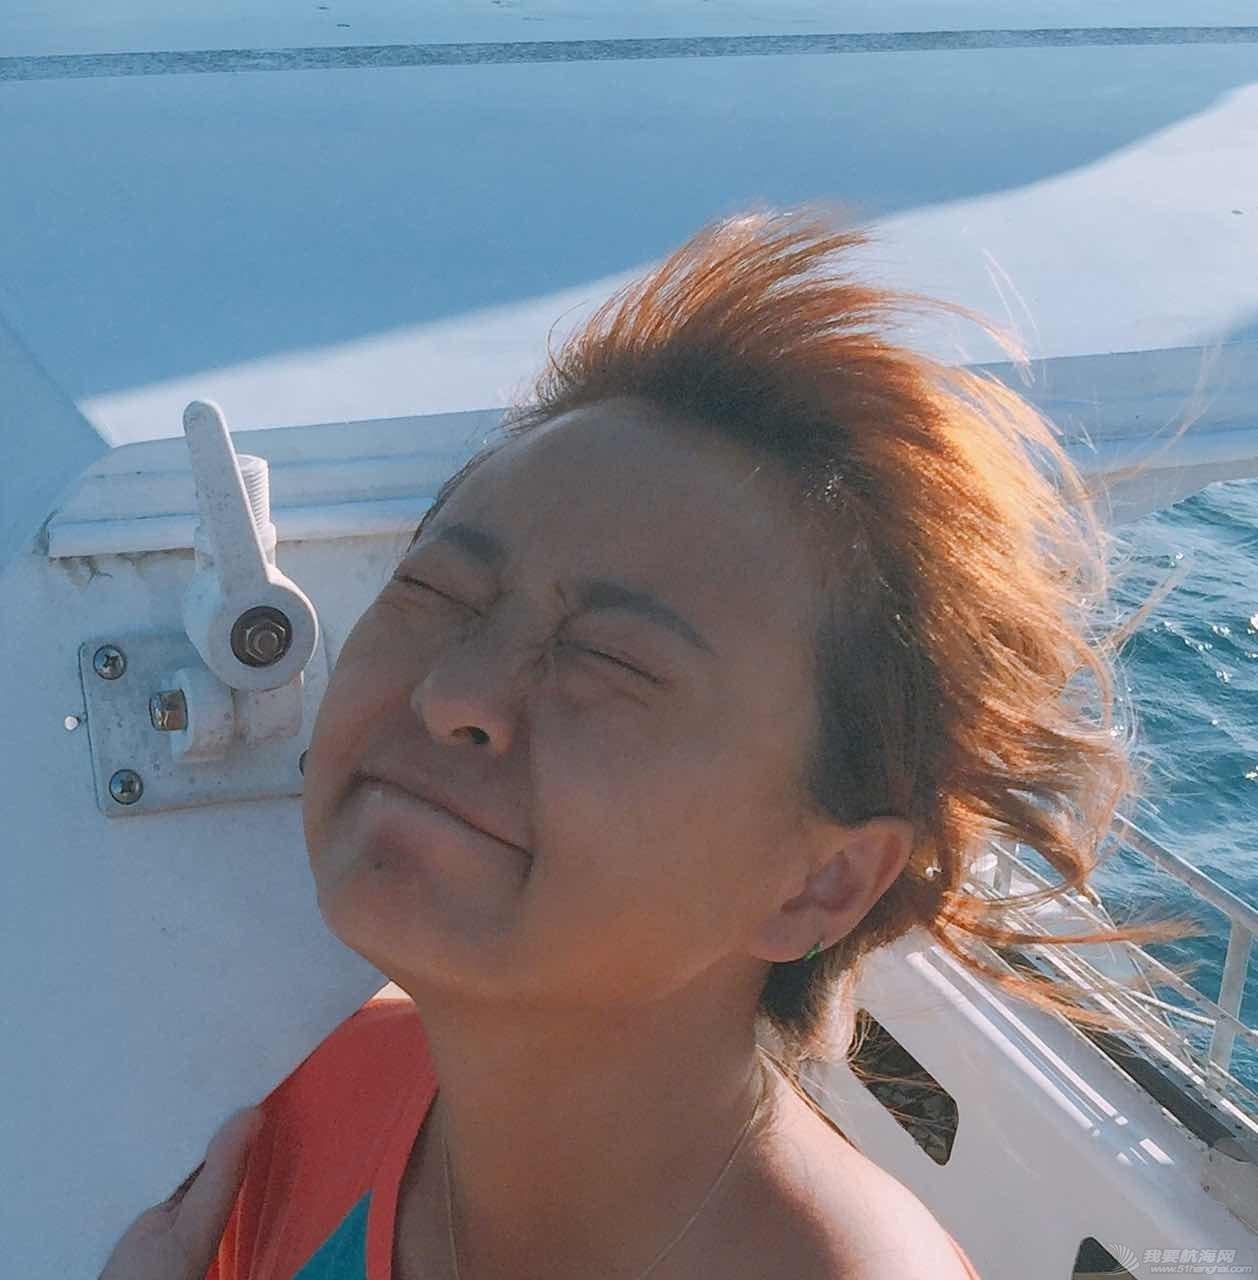 Ocean,Rover号船长,起航甘米银,帆船环球 Ocean Rover号船长的金点子,不看保你后悔! 451b04f7b7f61cfcb88f201601590c15.jpg